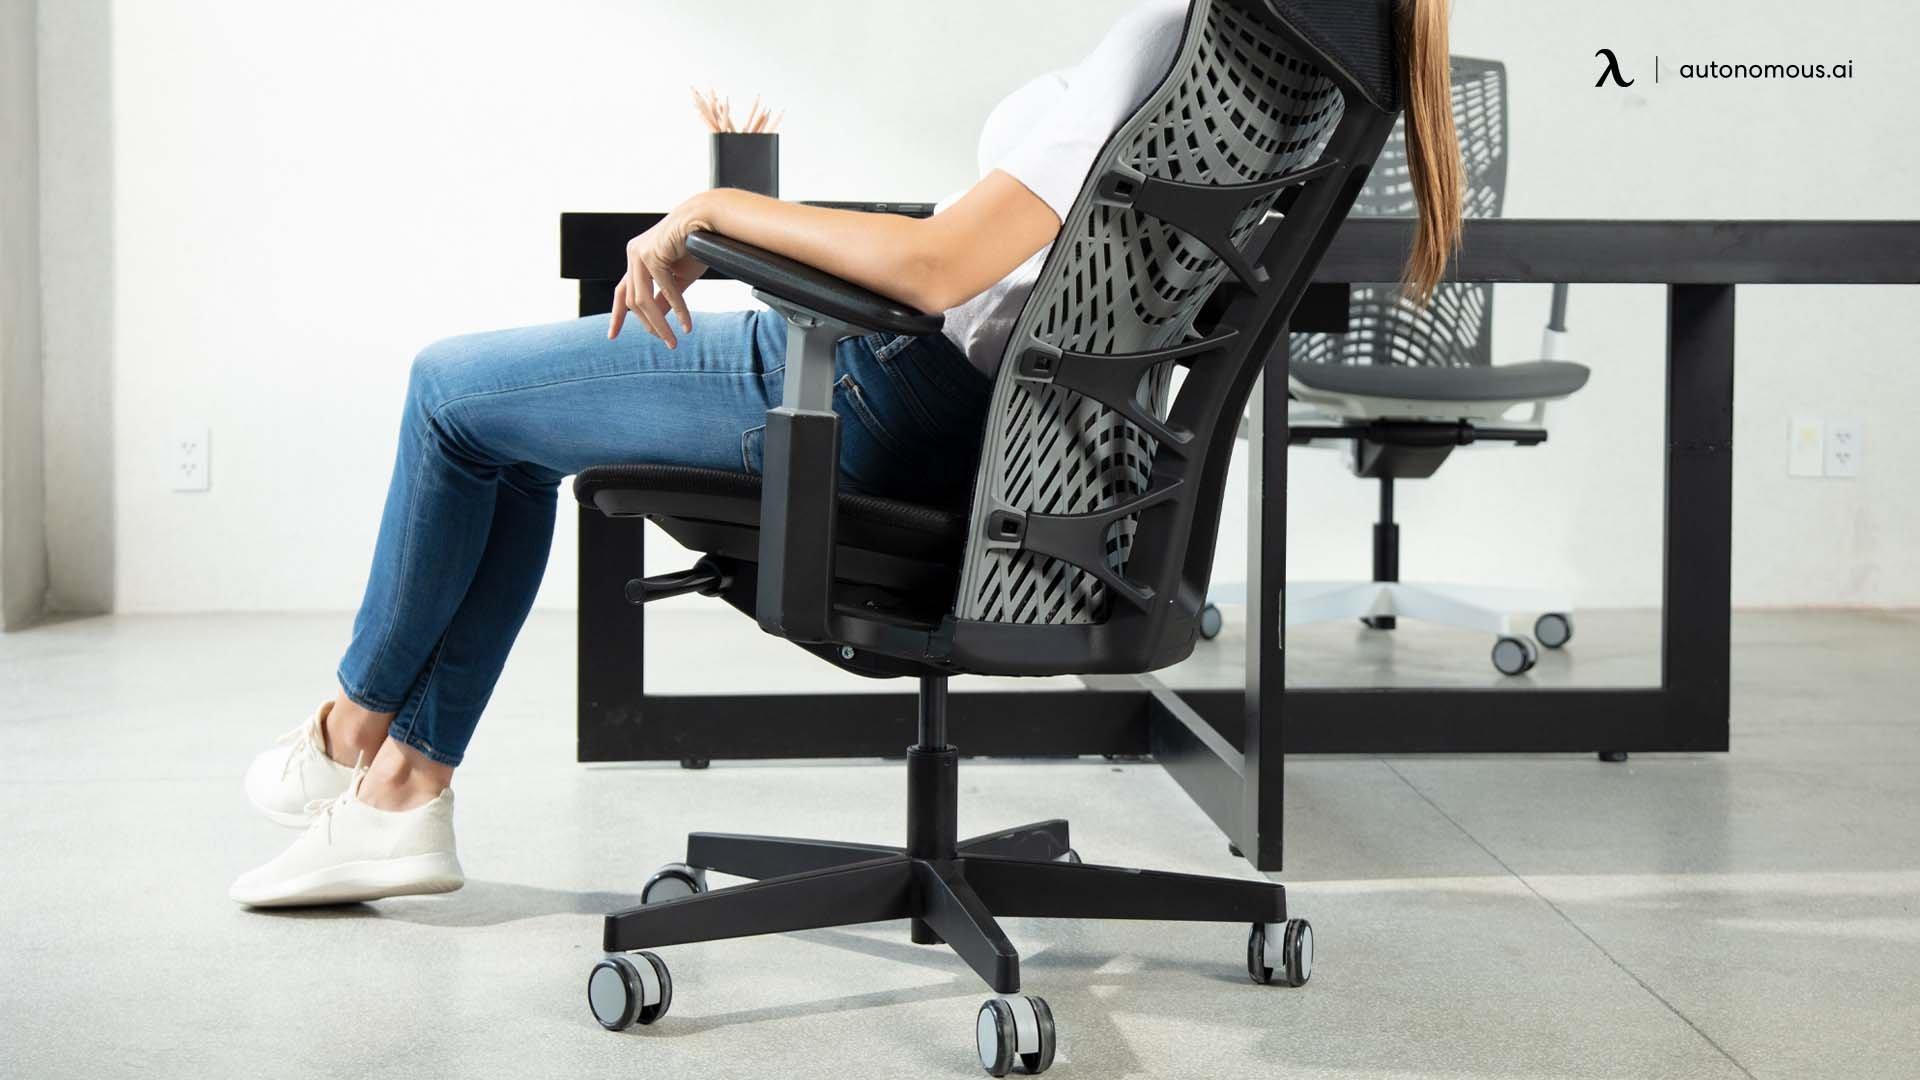 Ergonomic chair with armrest